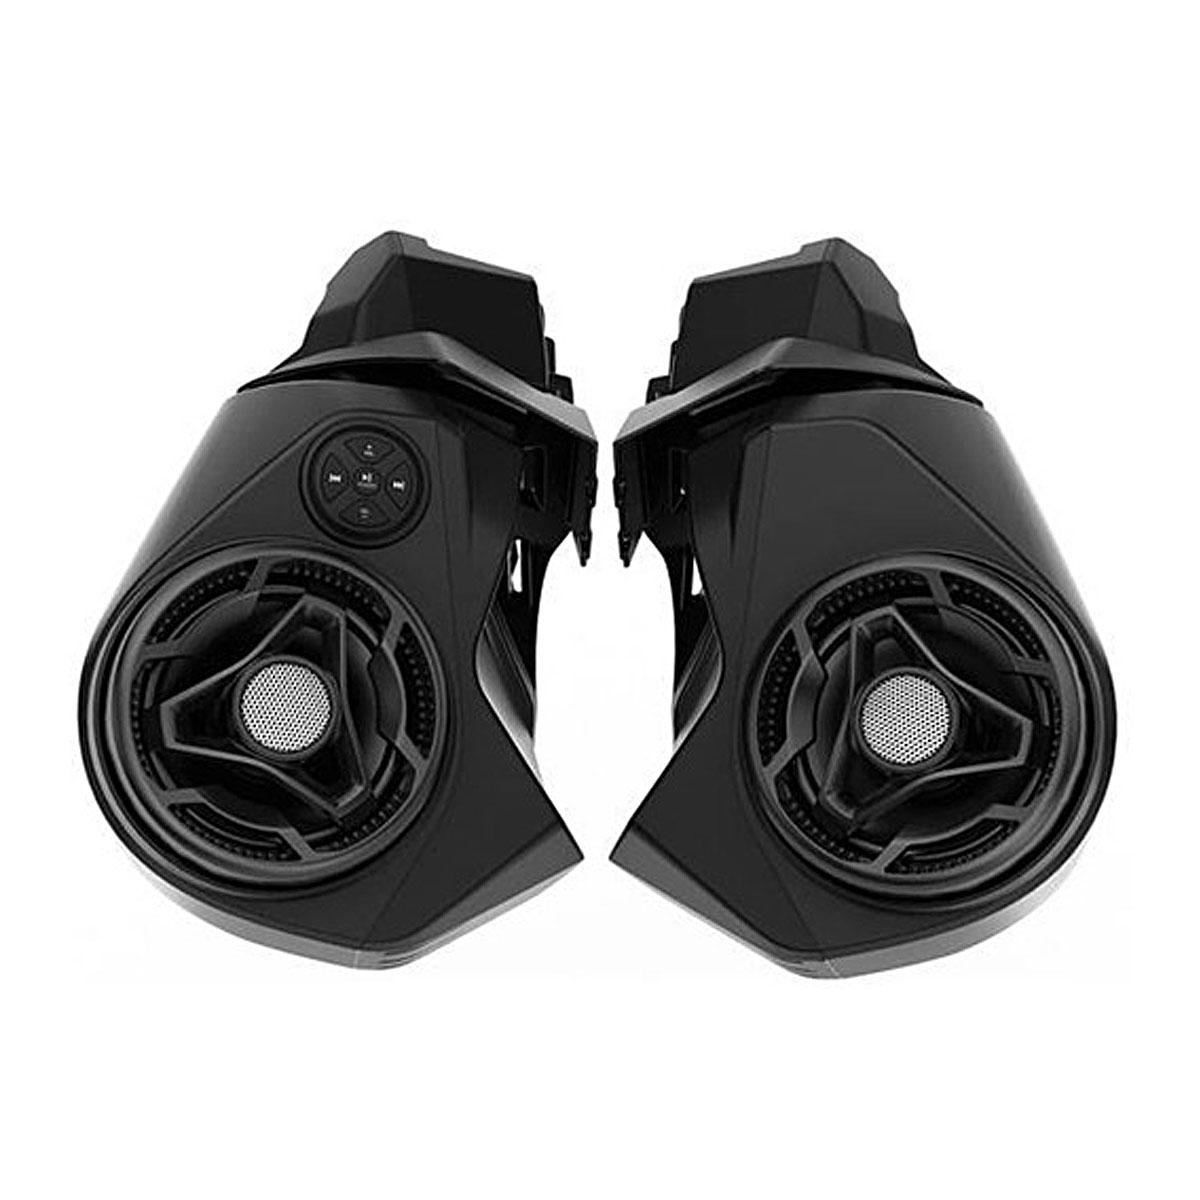 Sistema de Som com Bluetooth SEA DOO - RXT/GTX/PRO/FISH